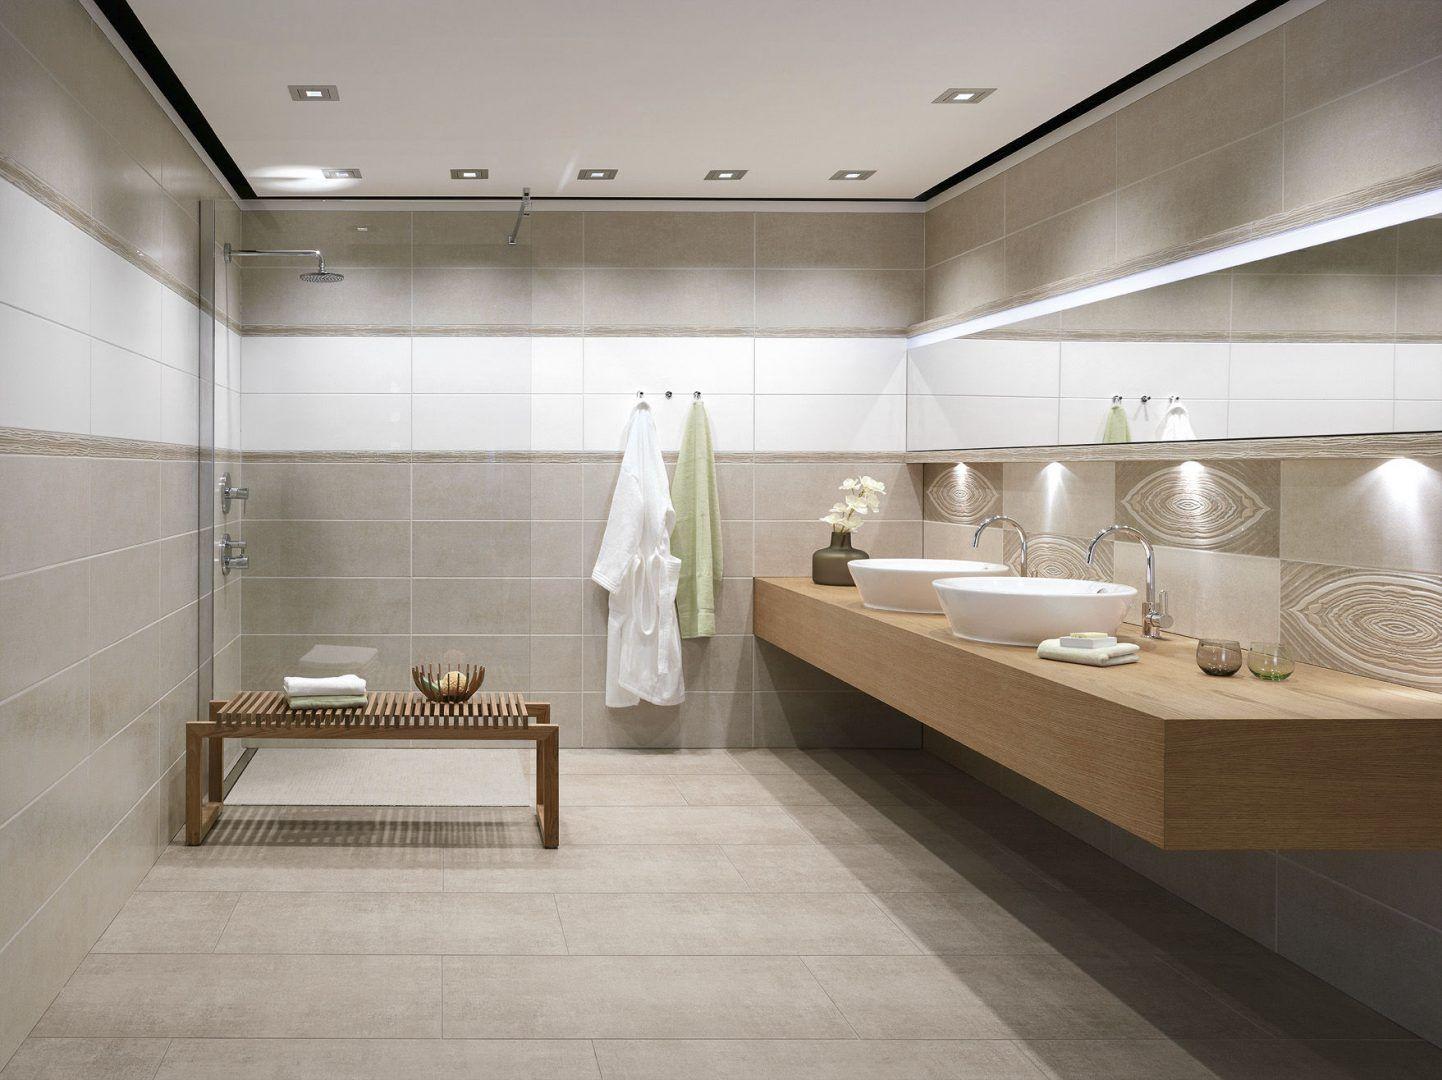 Azulejos ba o buscar con google 5recycle azulejos - Fotos de banos con azulejos ...